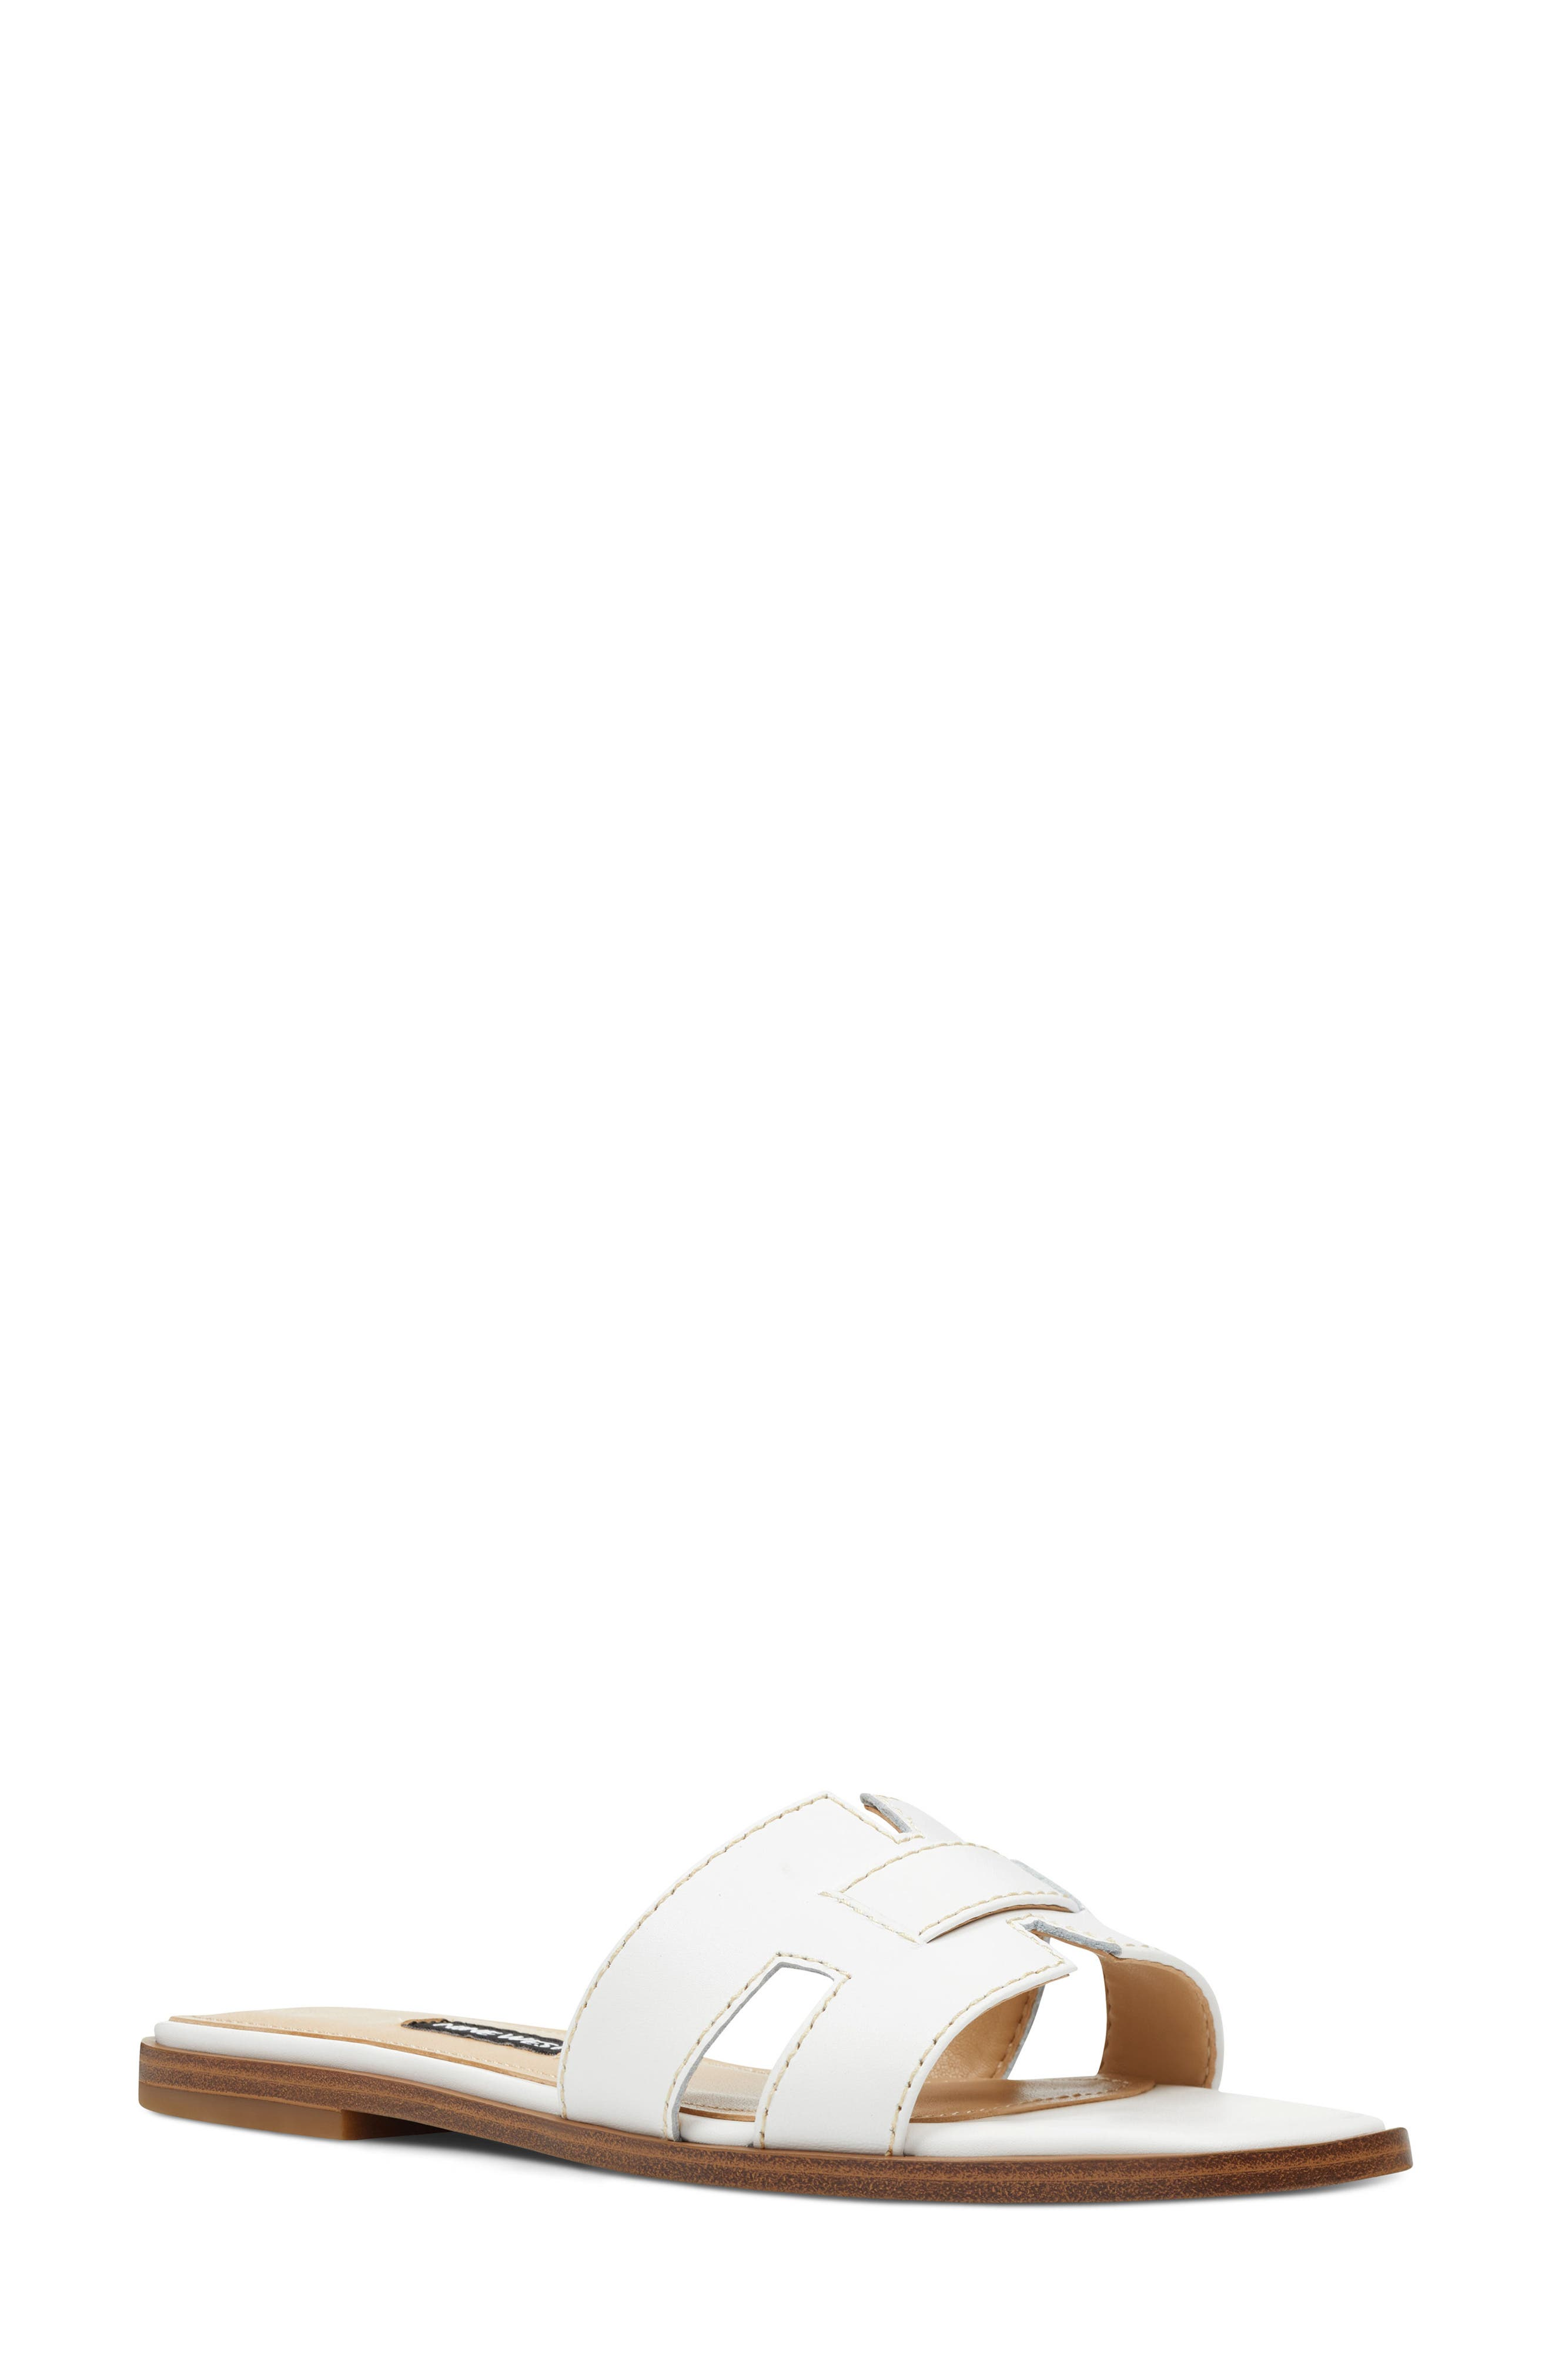 Gianna Cutout Slide Sandal, Main, color, WHITE LEATHER